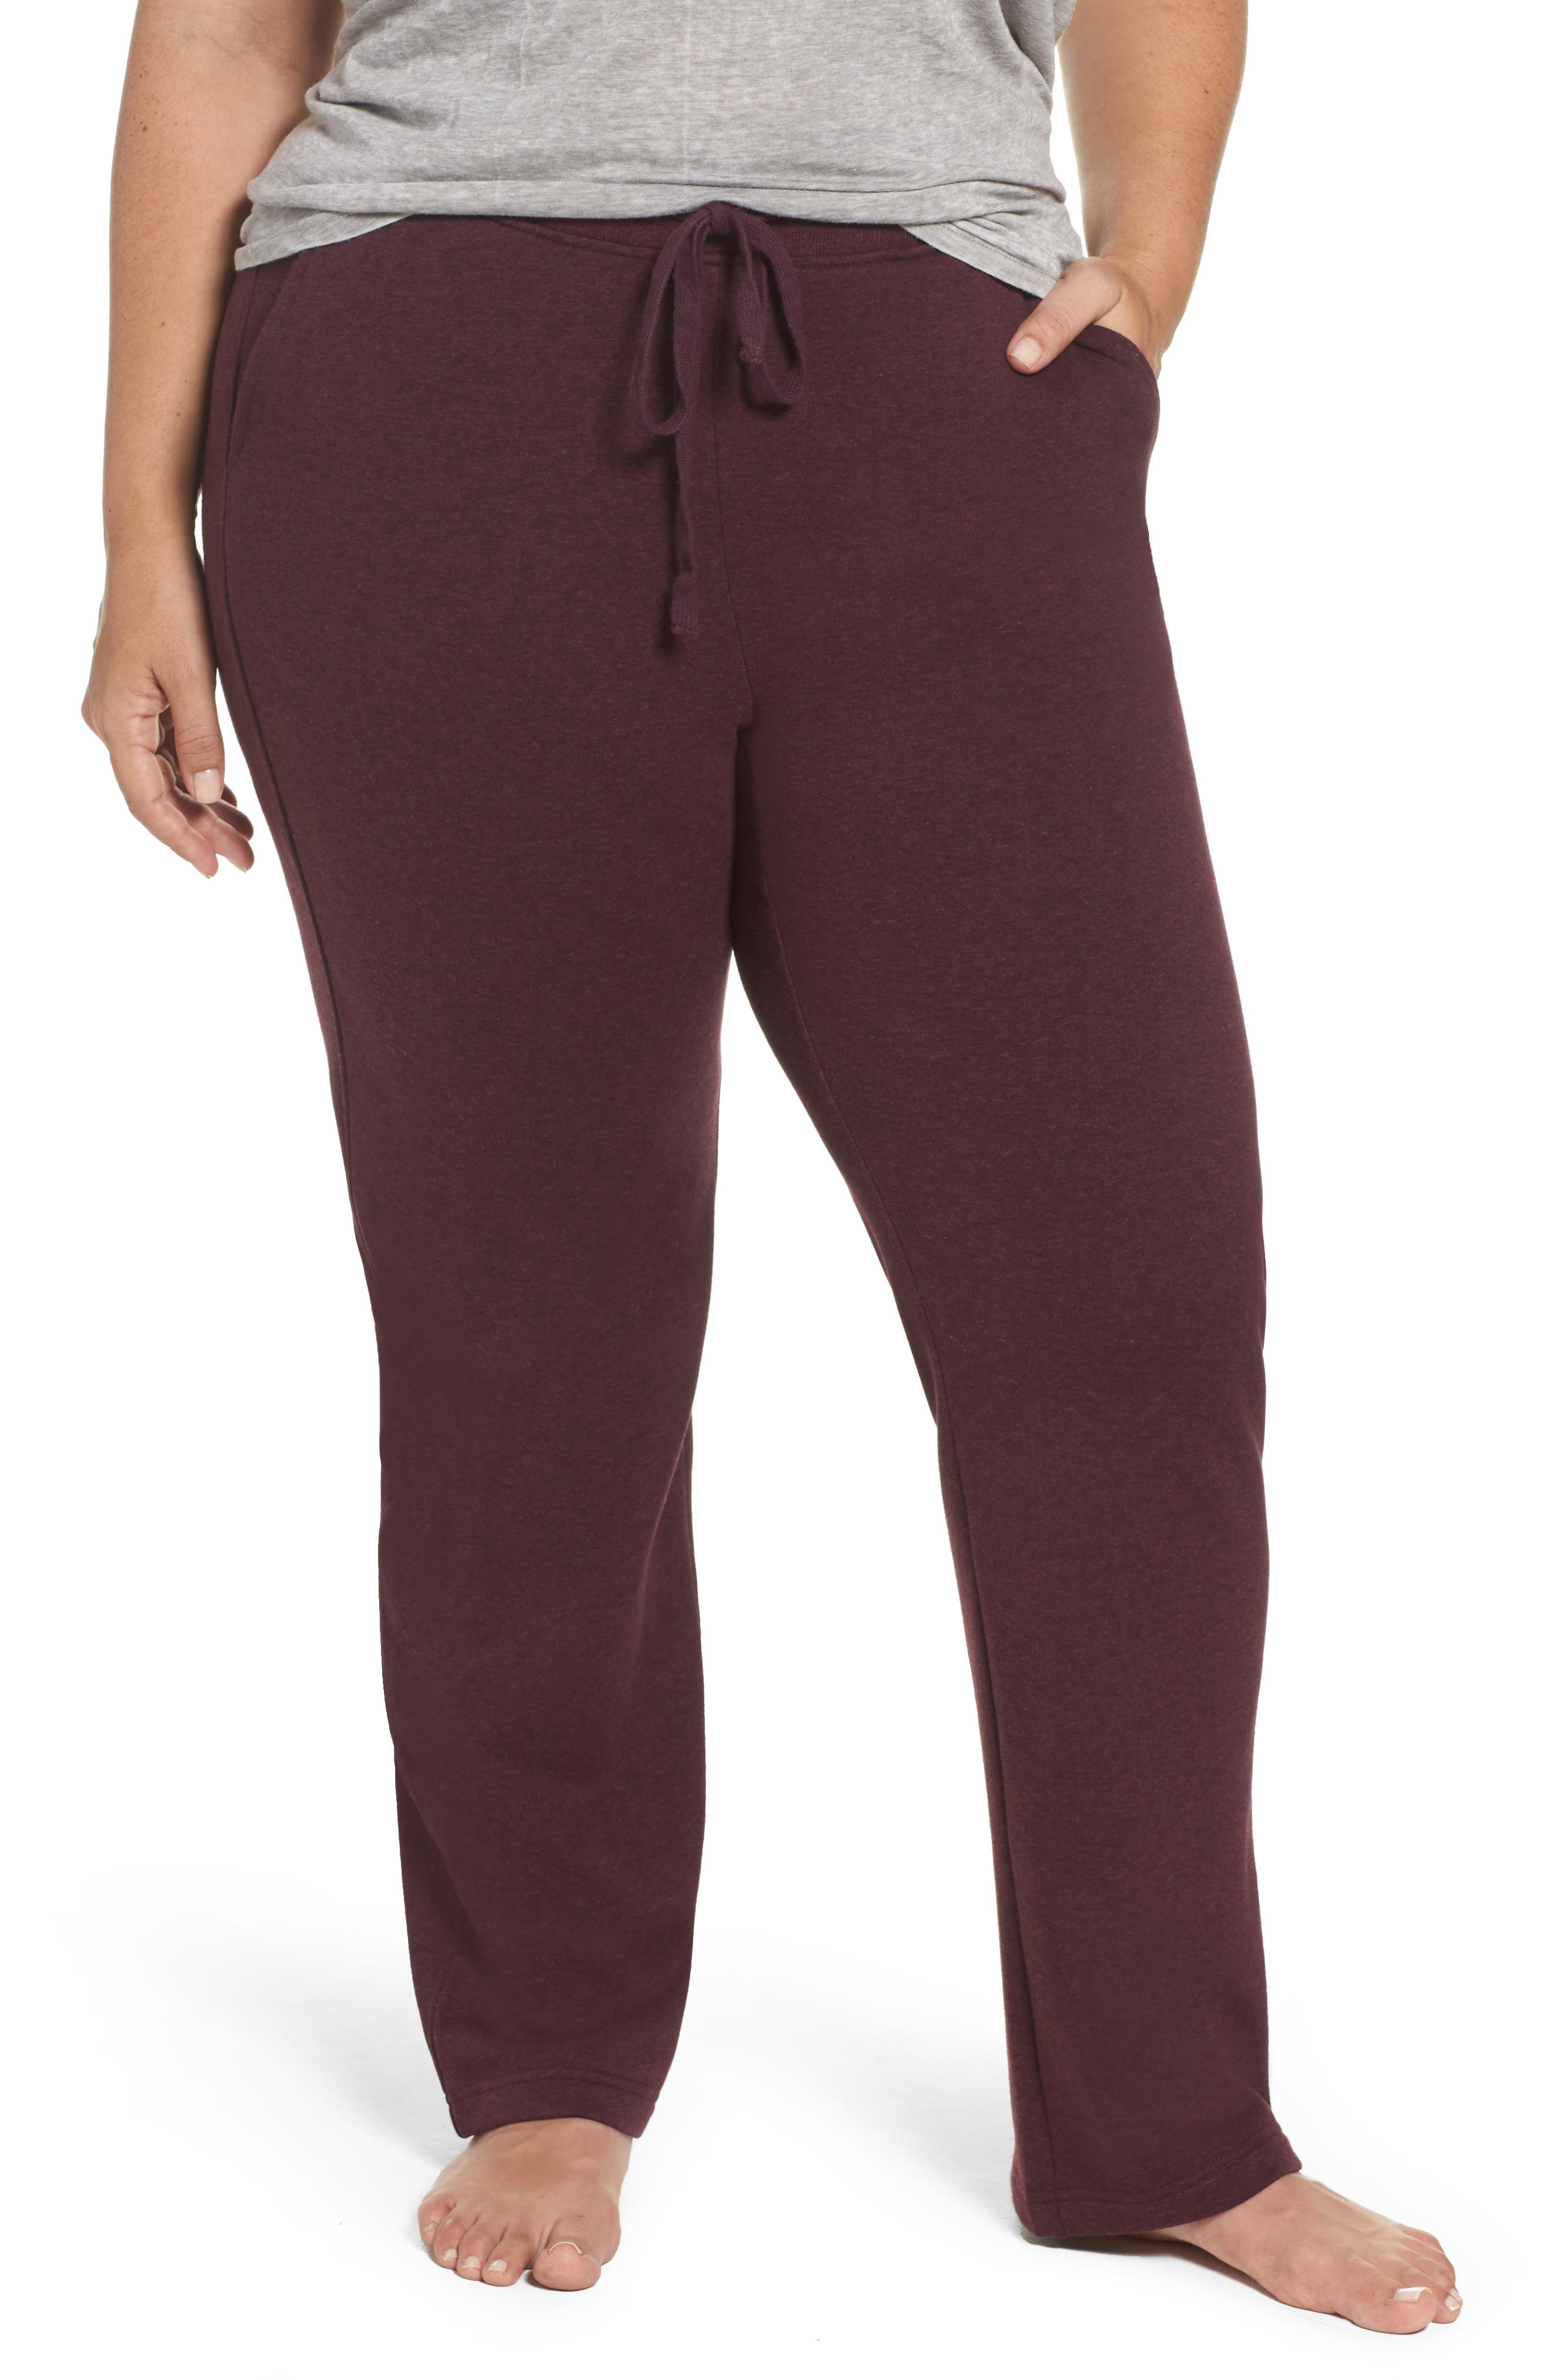 Alternate Image 1 Selected - UGG® Penny Fleece Sweatpants (Plus Size)